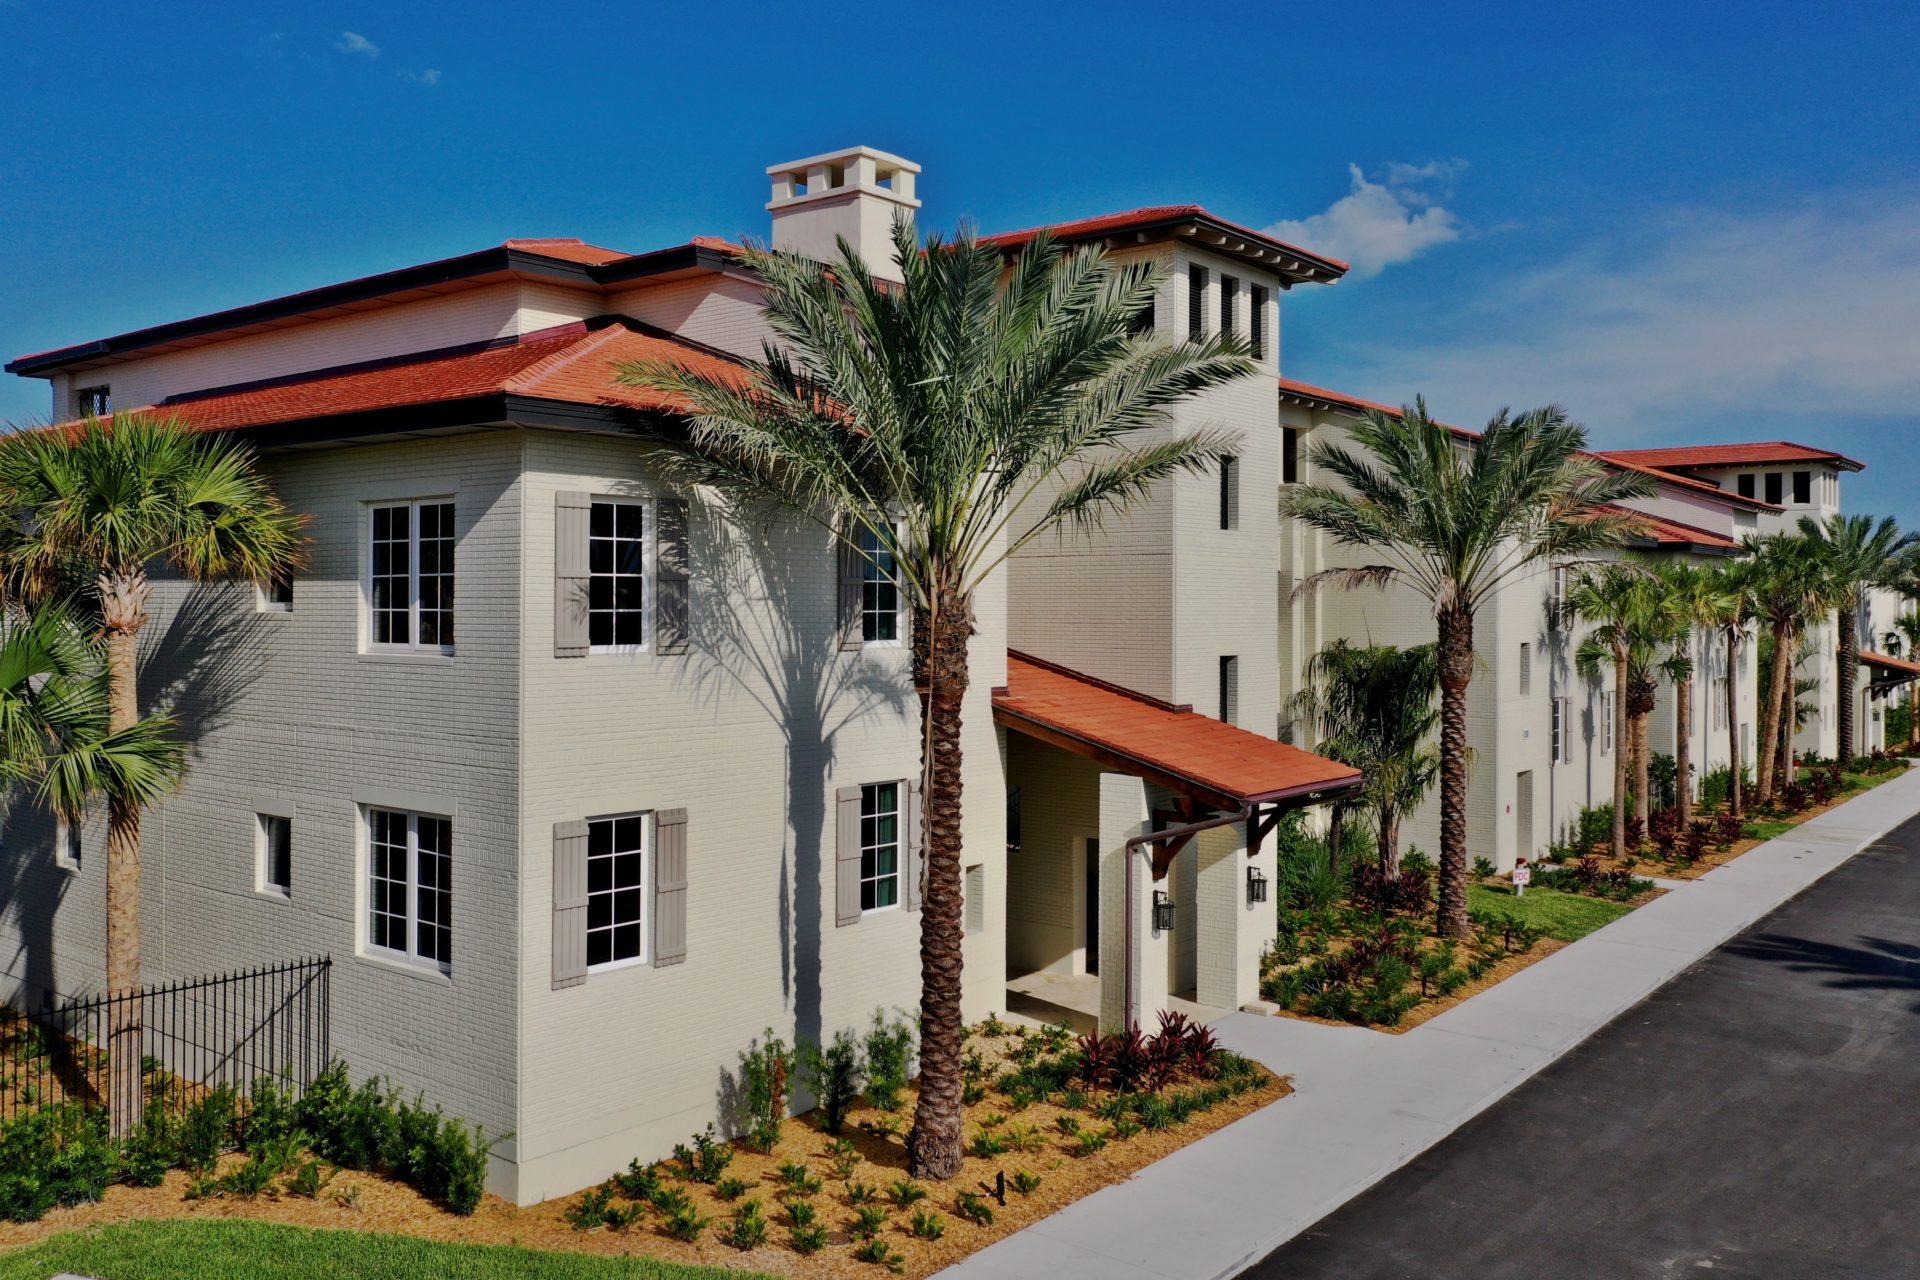 Peyton House and Ocean House, Ponte Vedra Inn & Club, Ponte Vedra Beach, FL – Best HotelMotel